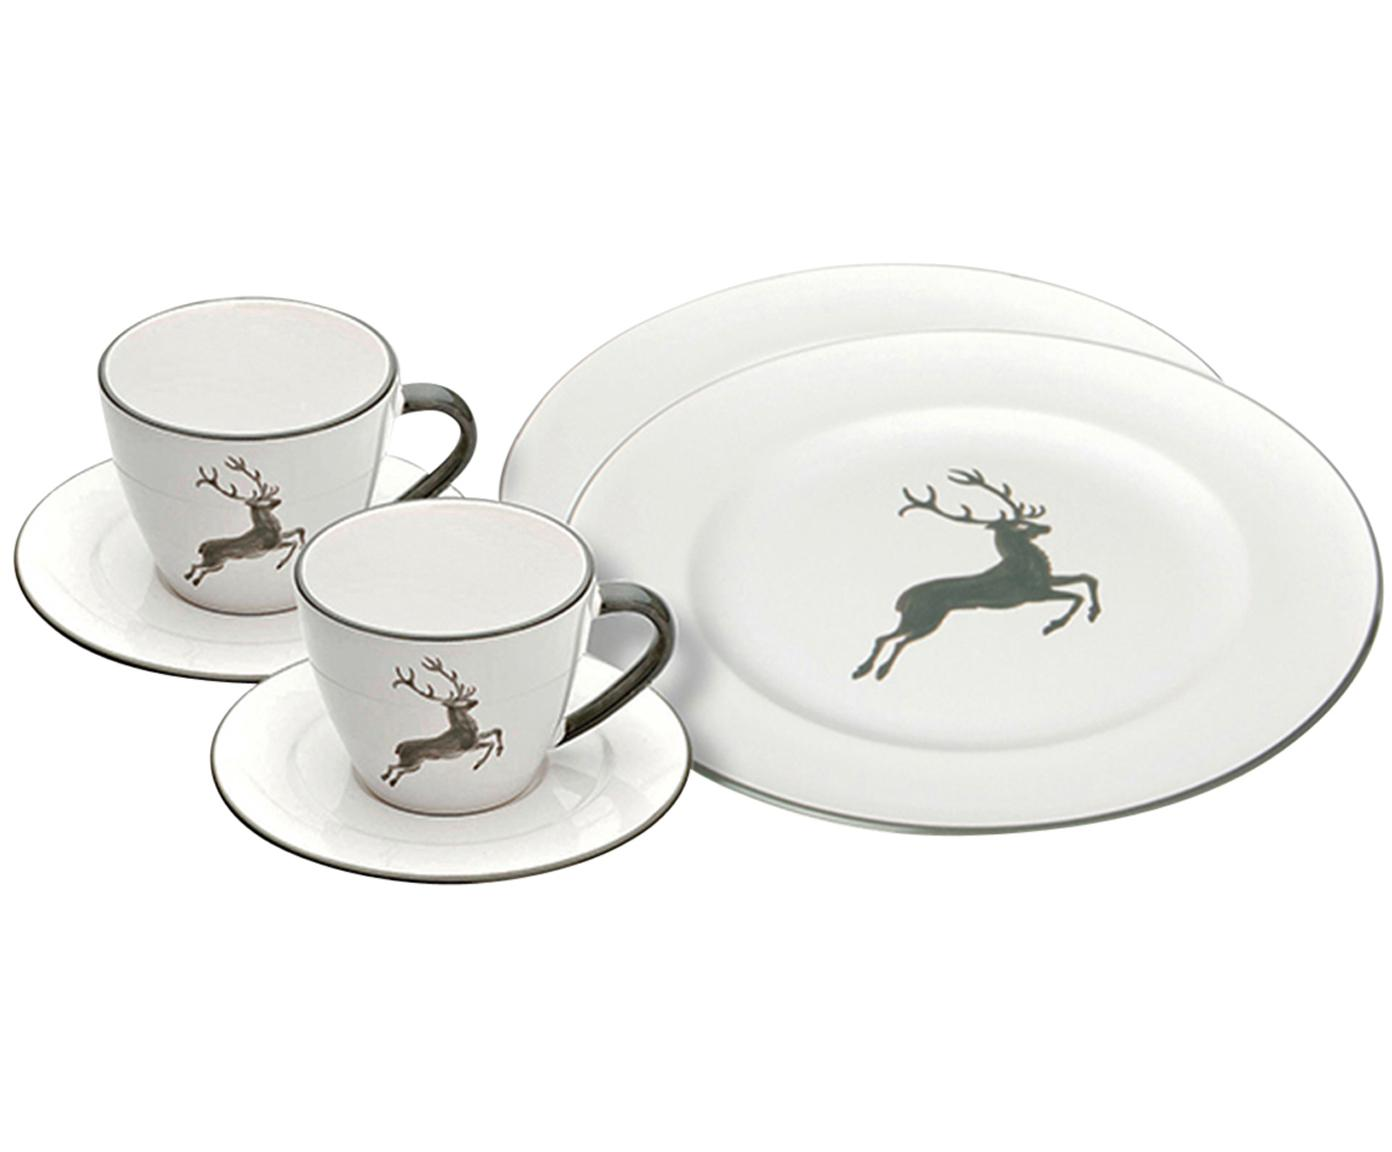 Kaffeeservice Gourmet Grauer Hirsch, 2 Personen (6-tlg.), Keramik, Grau,Weiß, verschiedene Größen